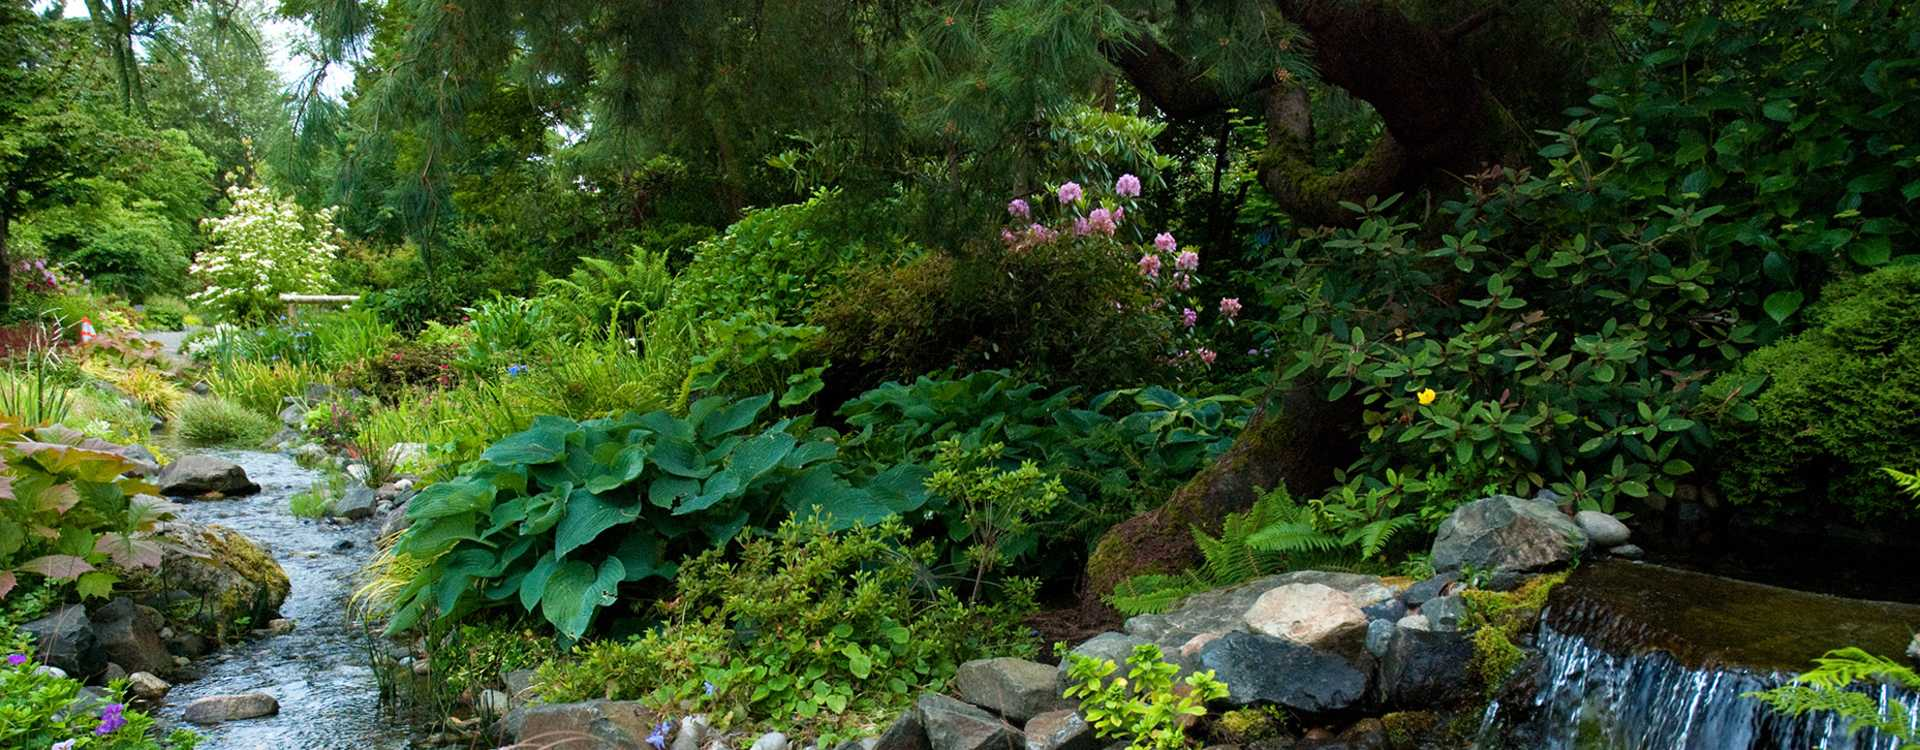 Mira's Garden